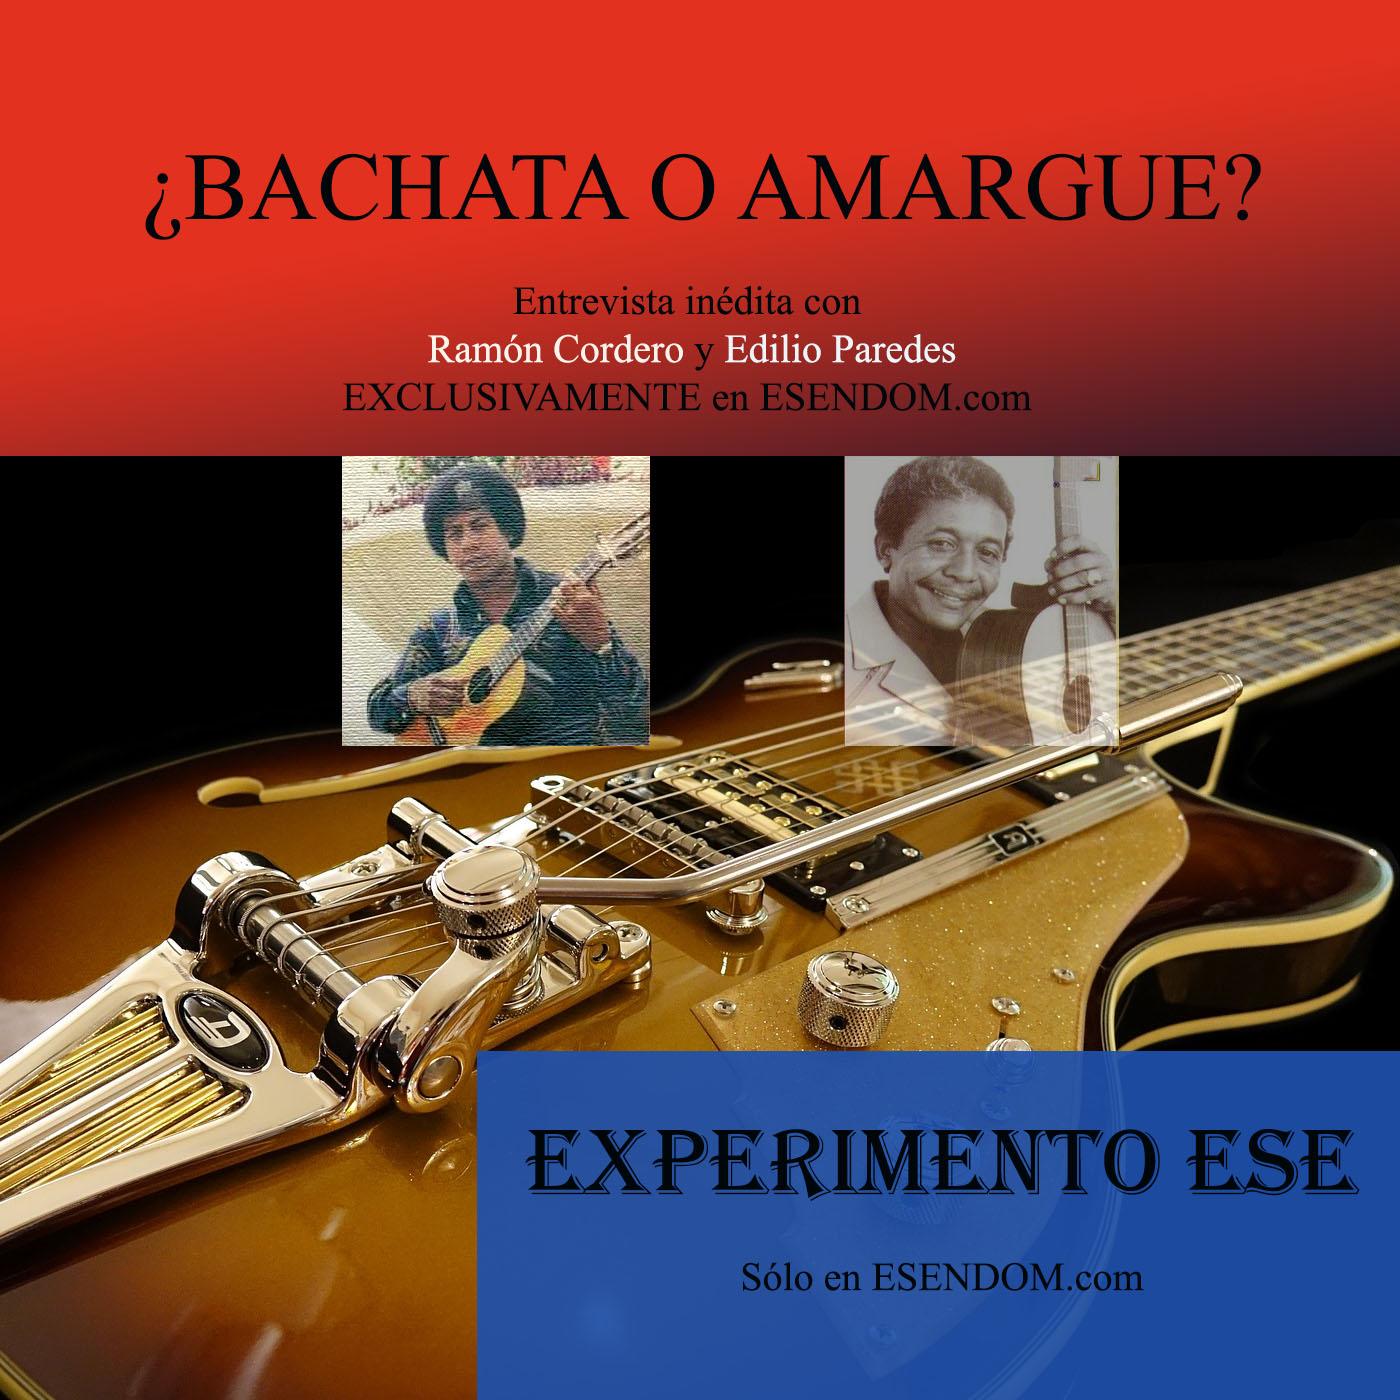 ADsCordero_Paredes_ExperimentoESE10.jpg